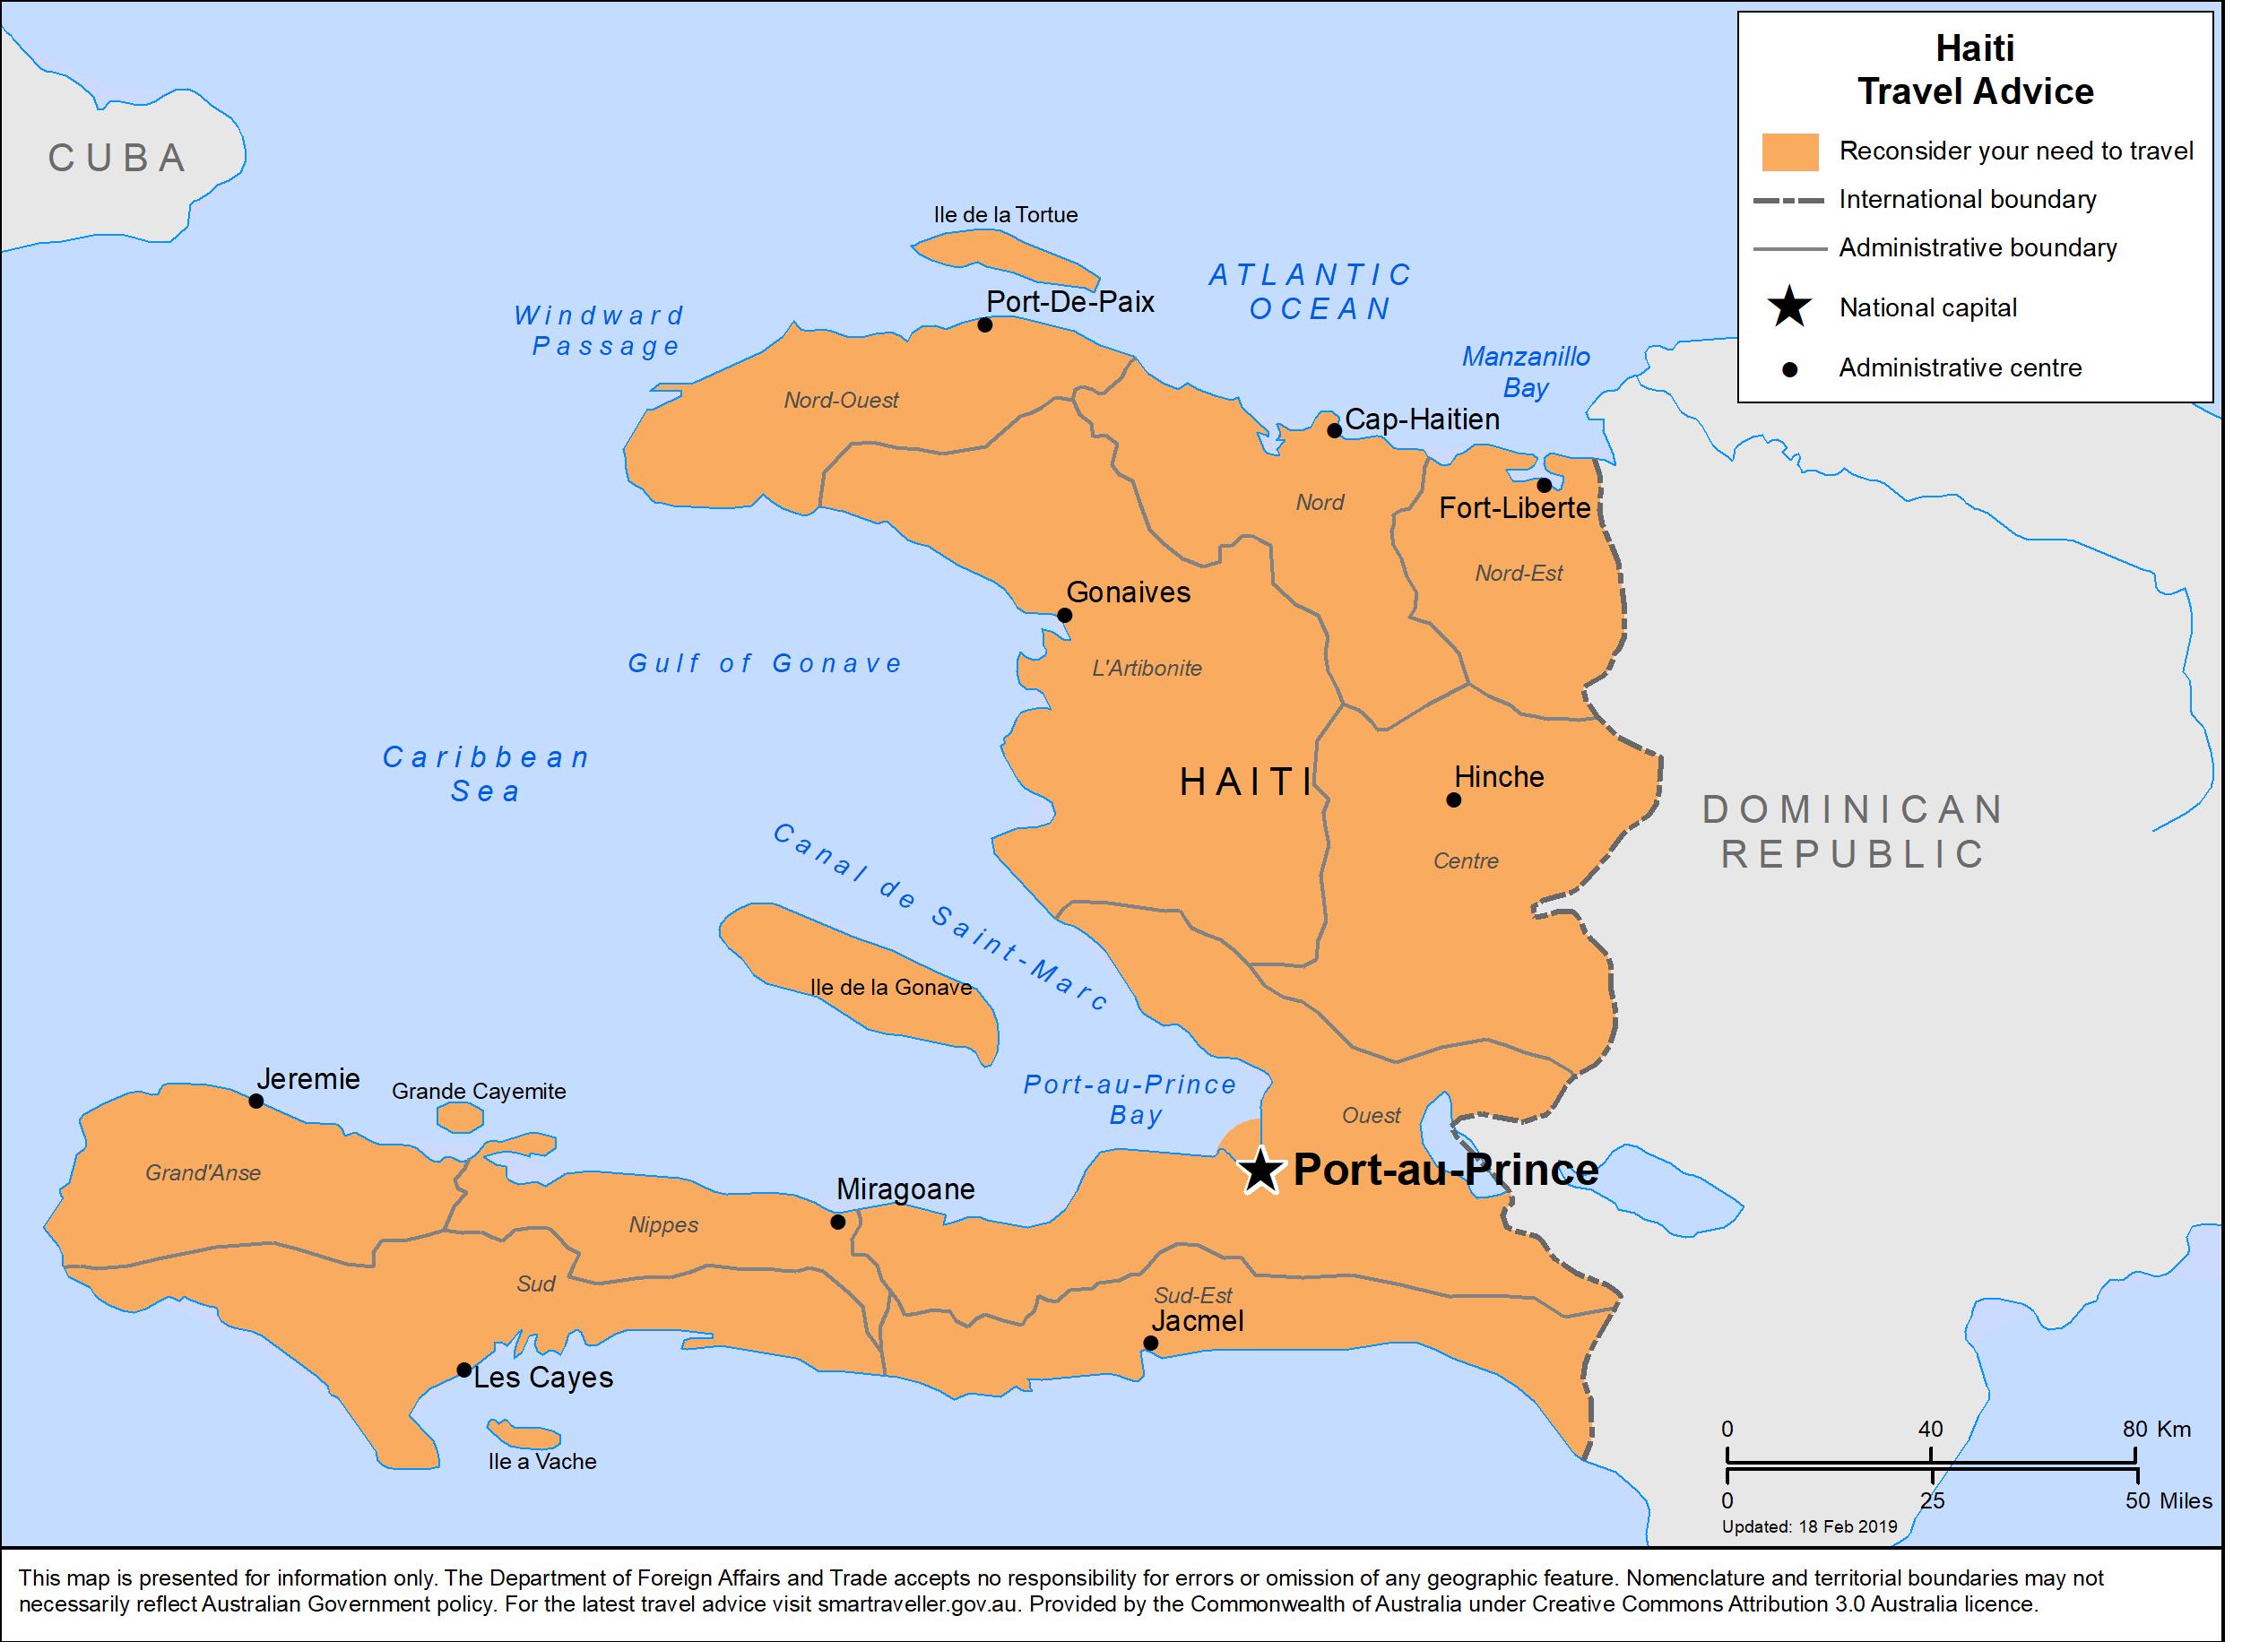 Haiti-Travel-Insurance | AardvarkCompare.com